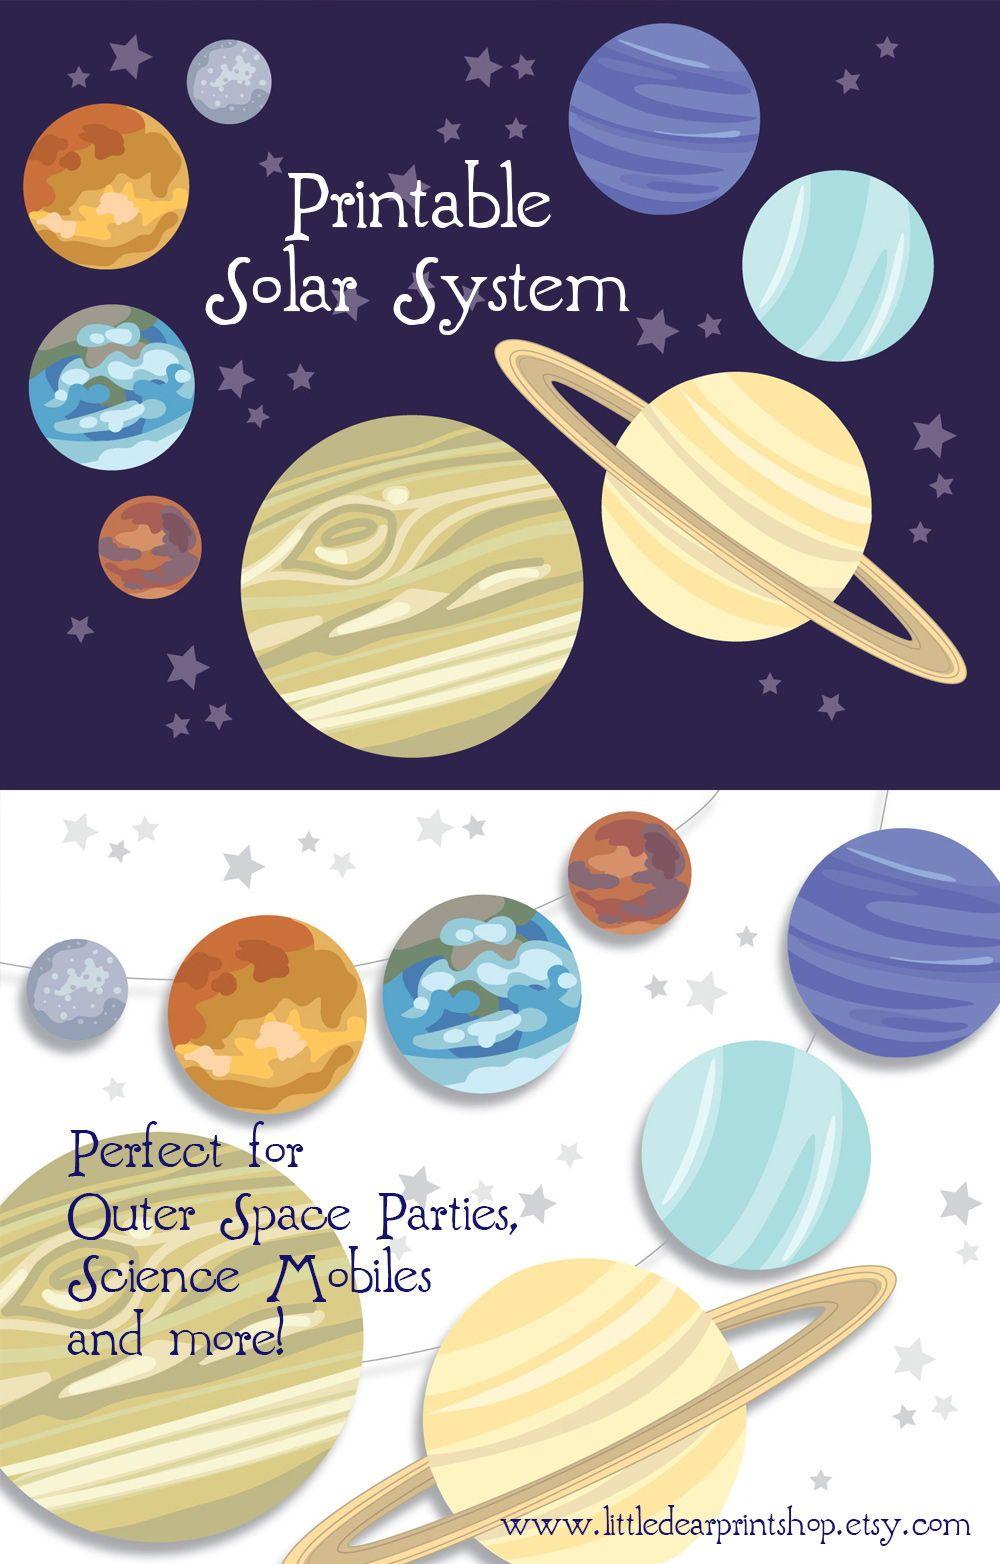 Printable Planet Pictures : printable, planet, pictures, Printable, Planets!, Solar, System, Outer, Space, Party,, Decorating, Sc…, Planet, Party, Decorations